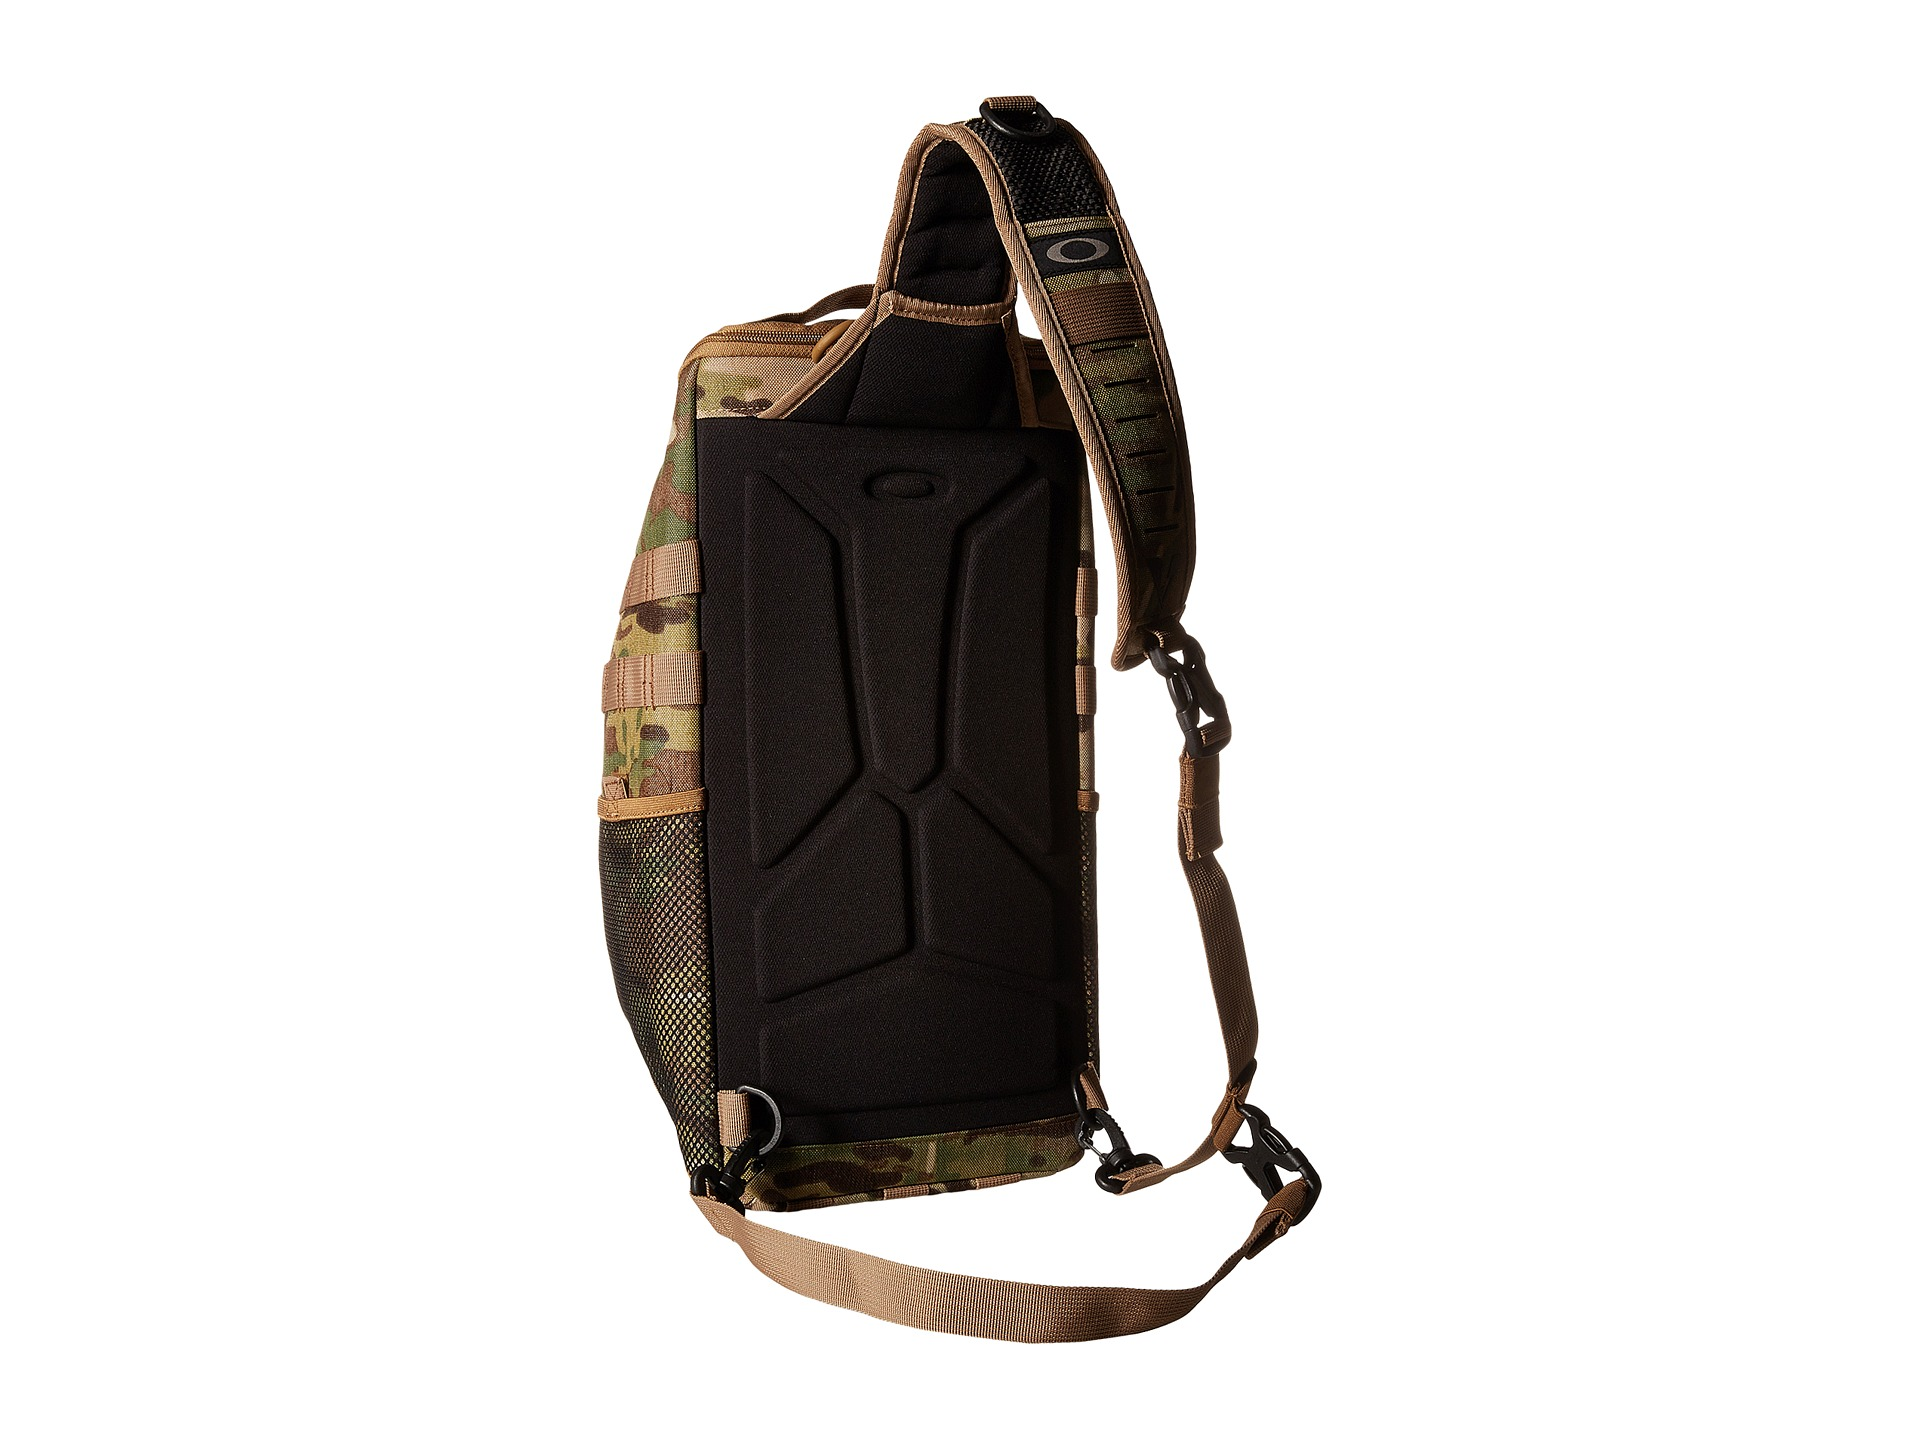 db41ba32762 Oakley Multicam Backpack Review